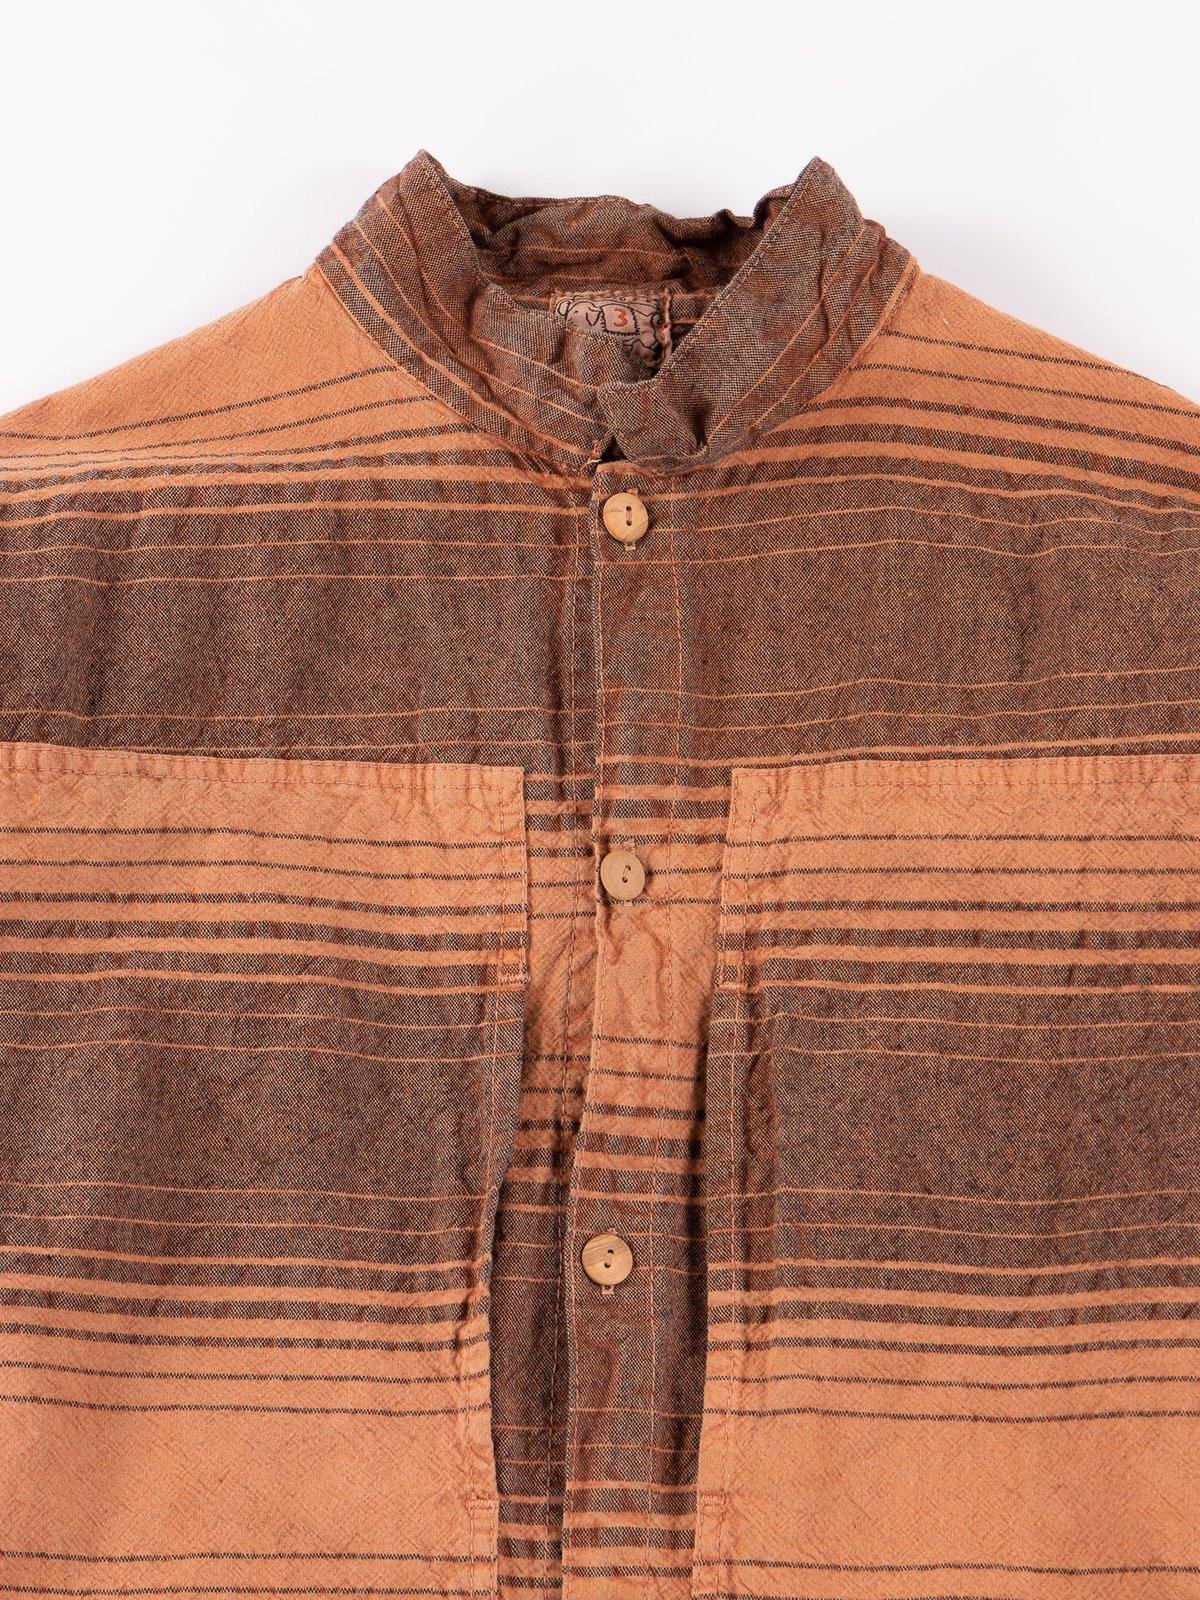 Red Ochre Dye Indigo Doppler Stripe Calico Periscope Pocket Tail Shirt - Image 3